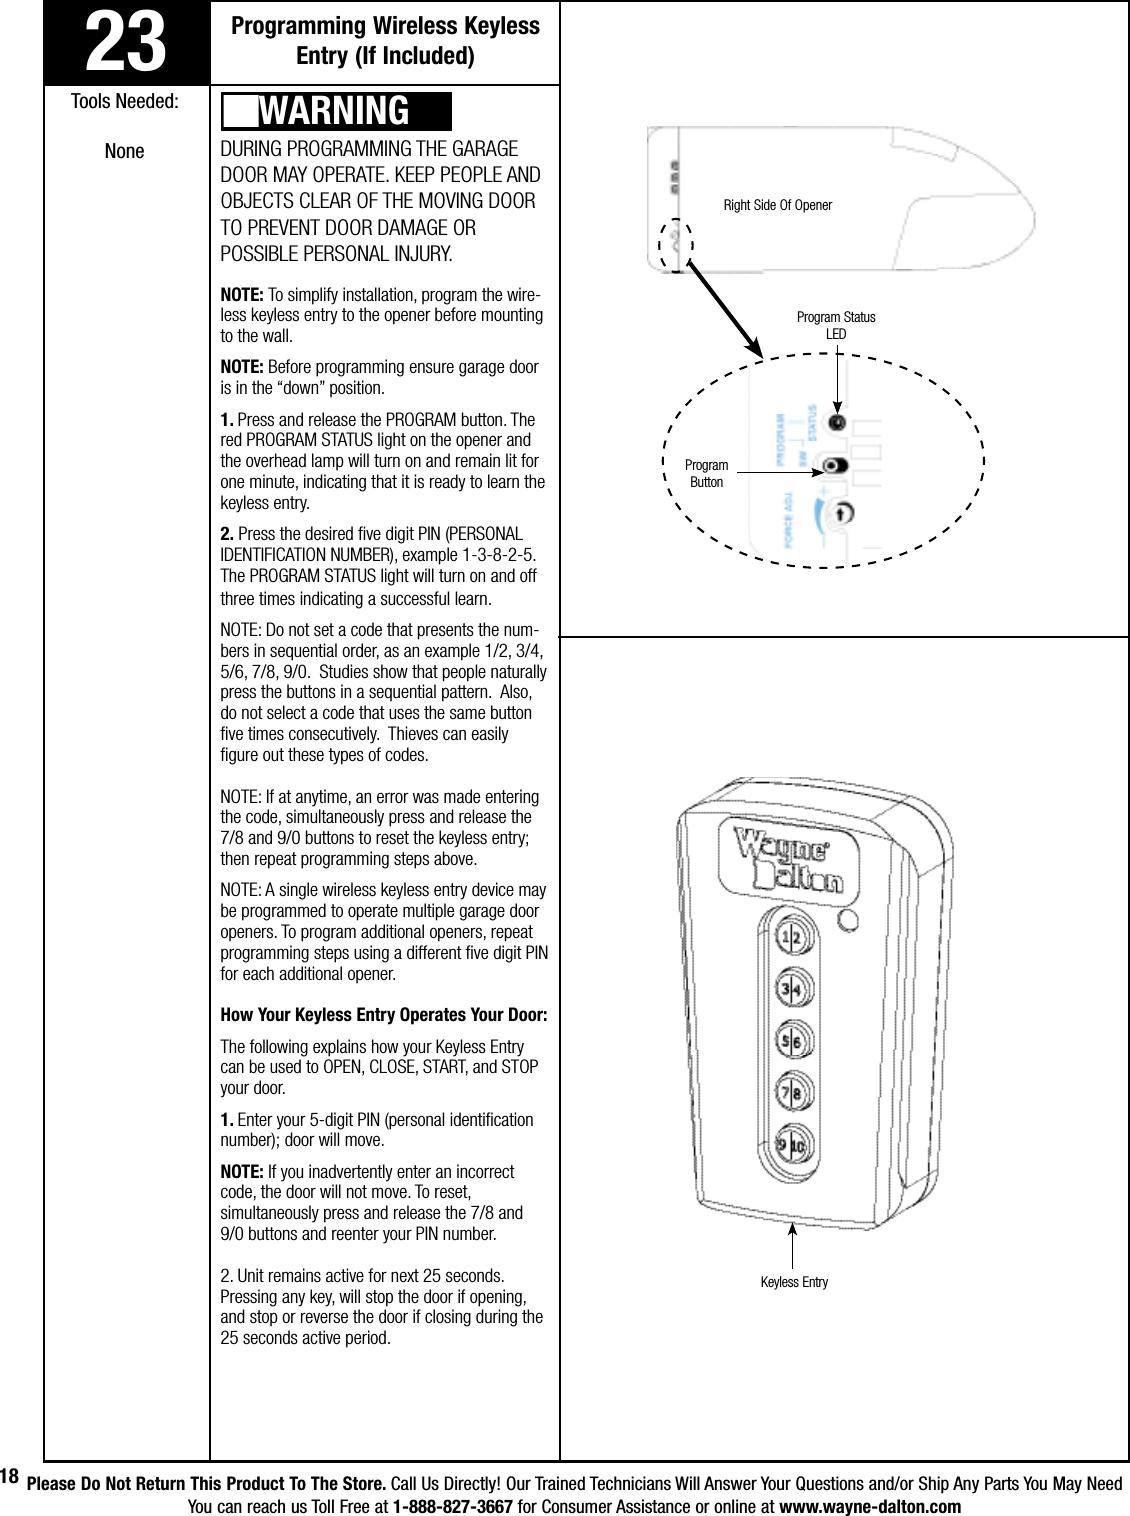 Zooz Z Manual Guide